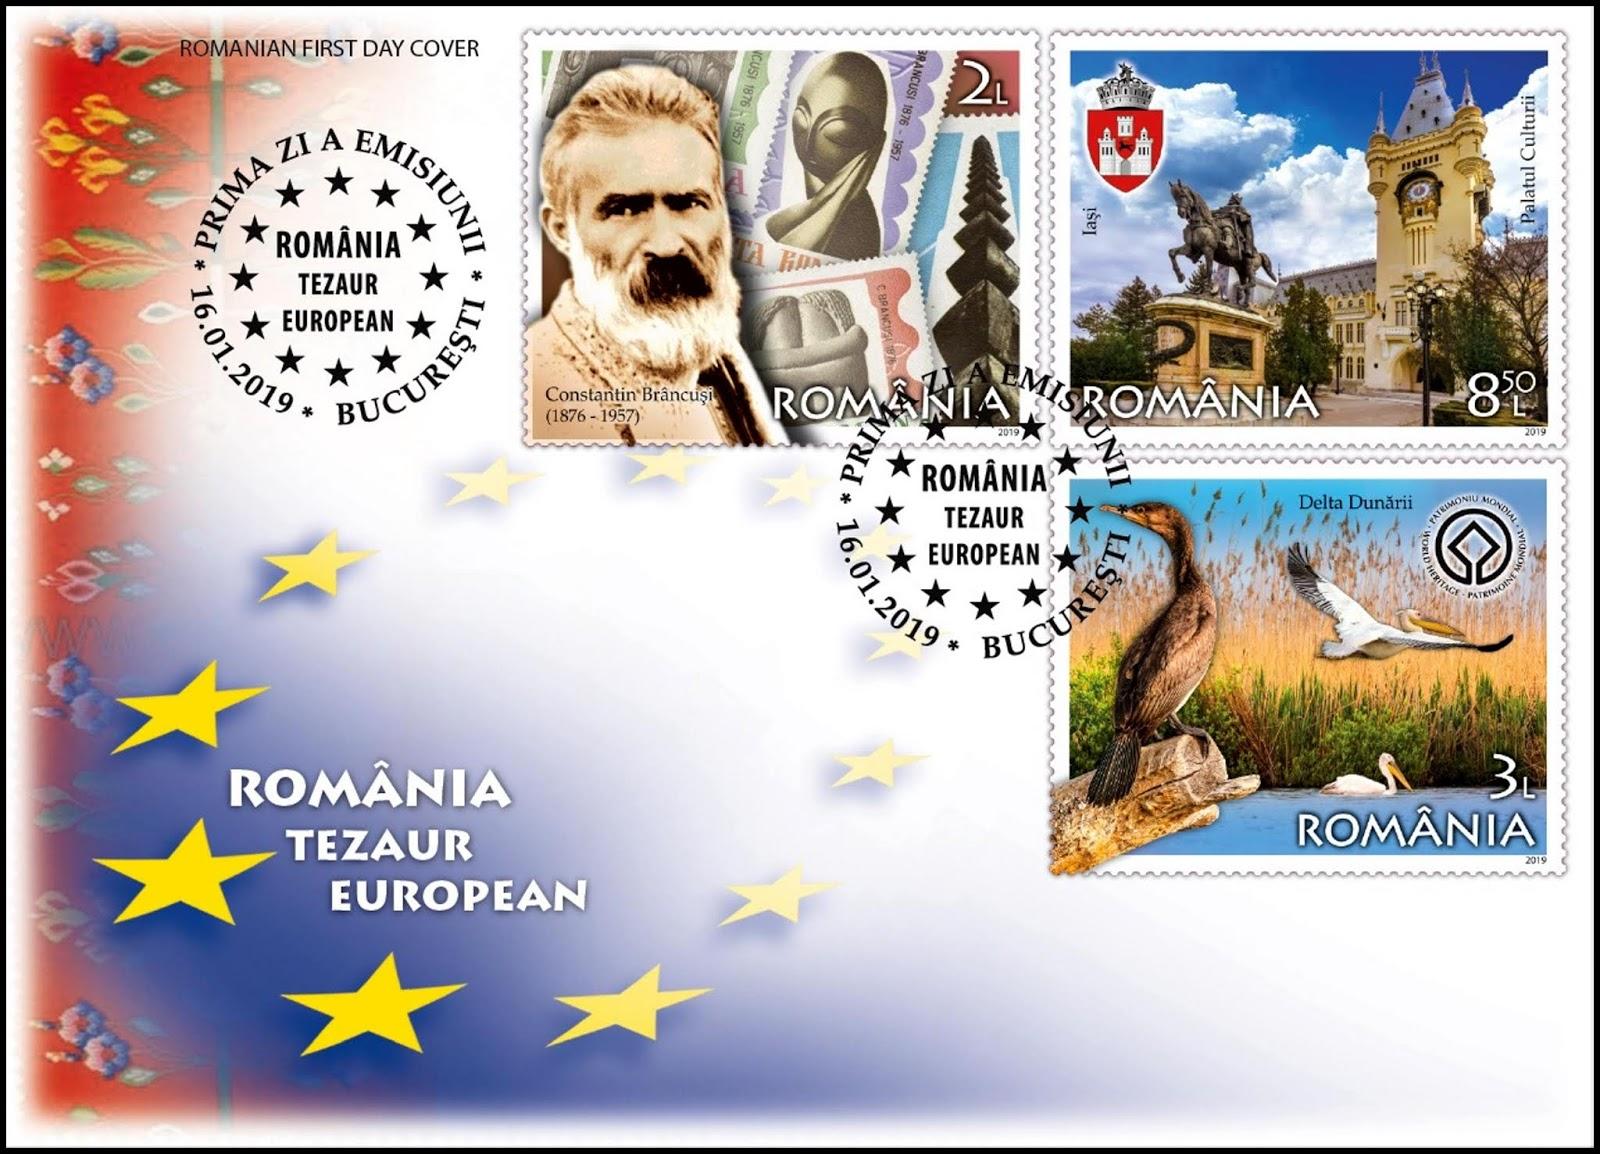 Romania - A European Treasure (January 16, 2019) first day cover #2